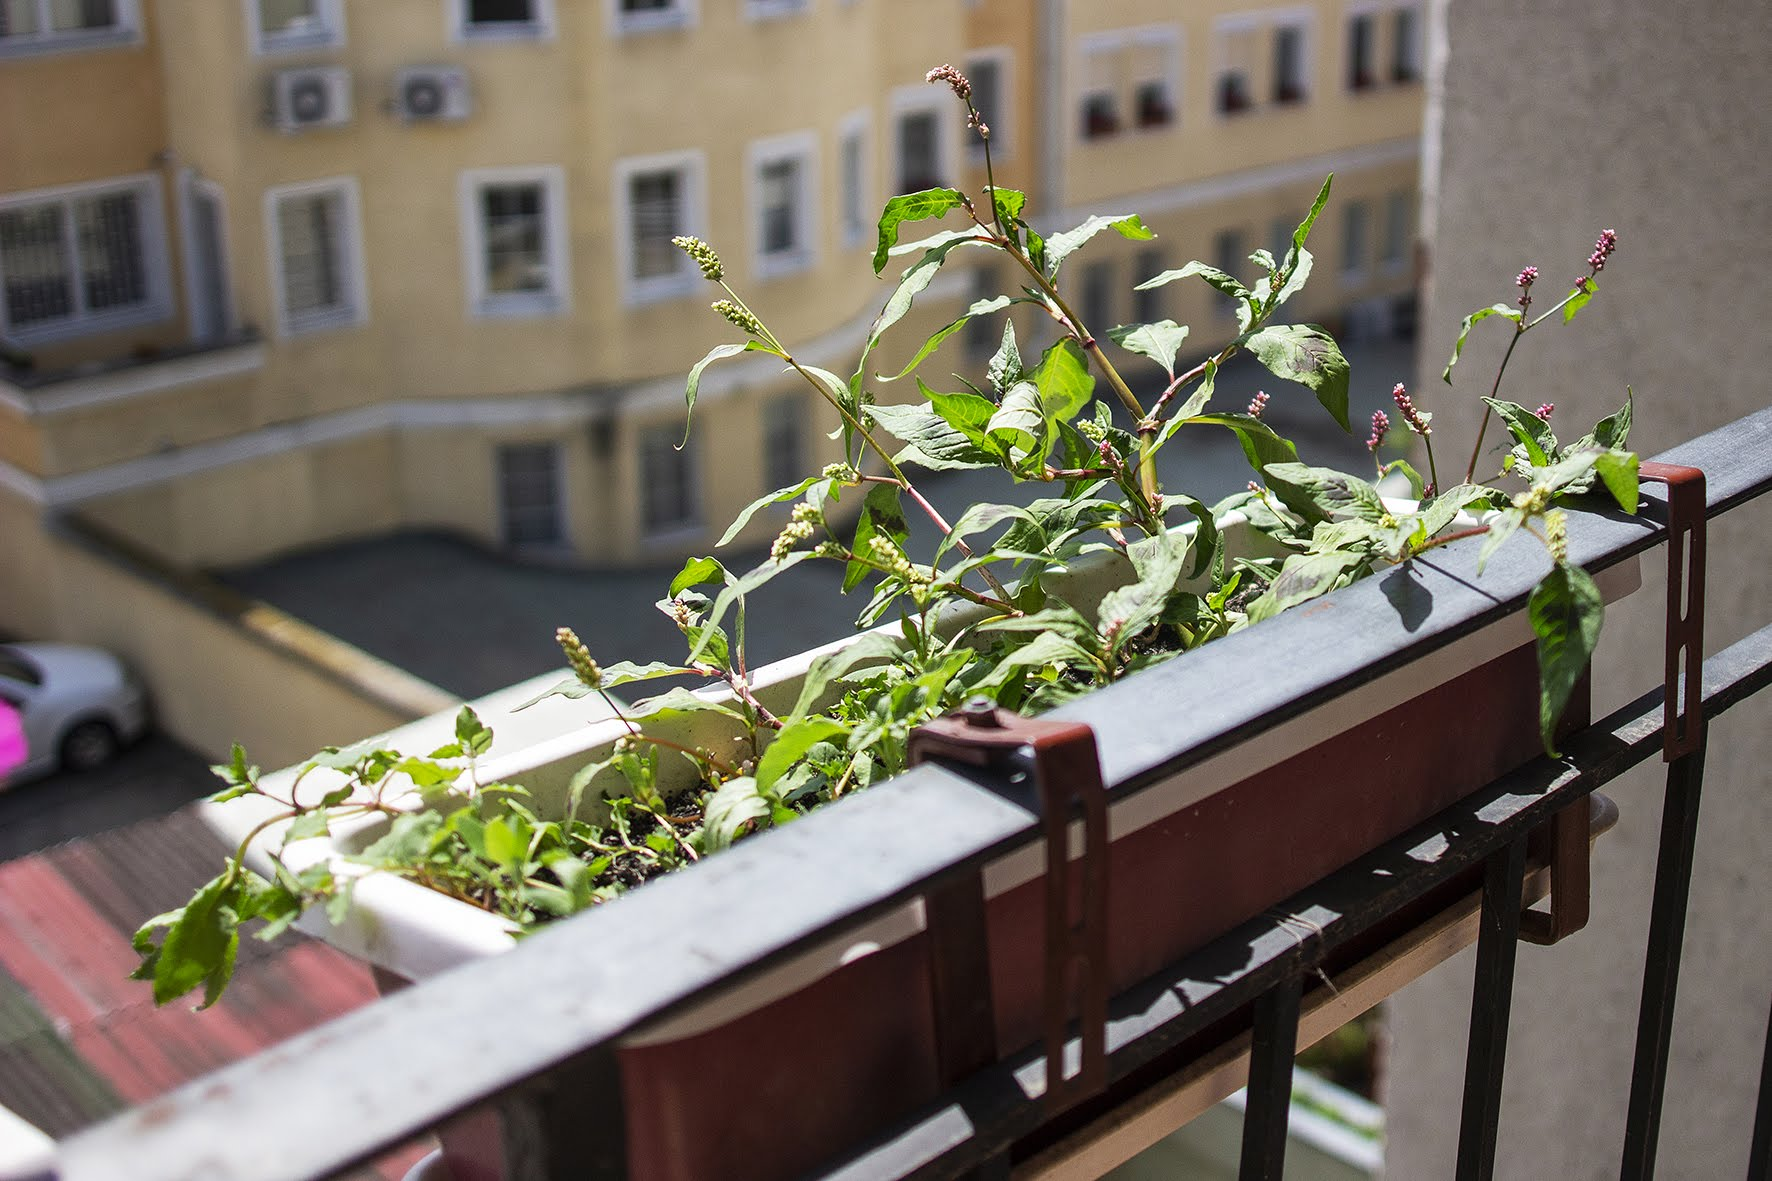 balkonfanatik_rozgonyizsofiaphoto_david1266.jpg